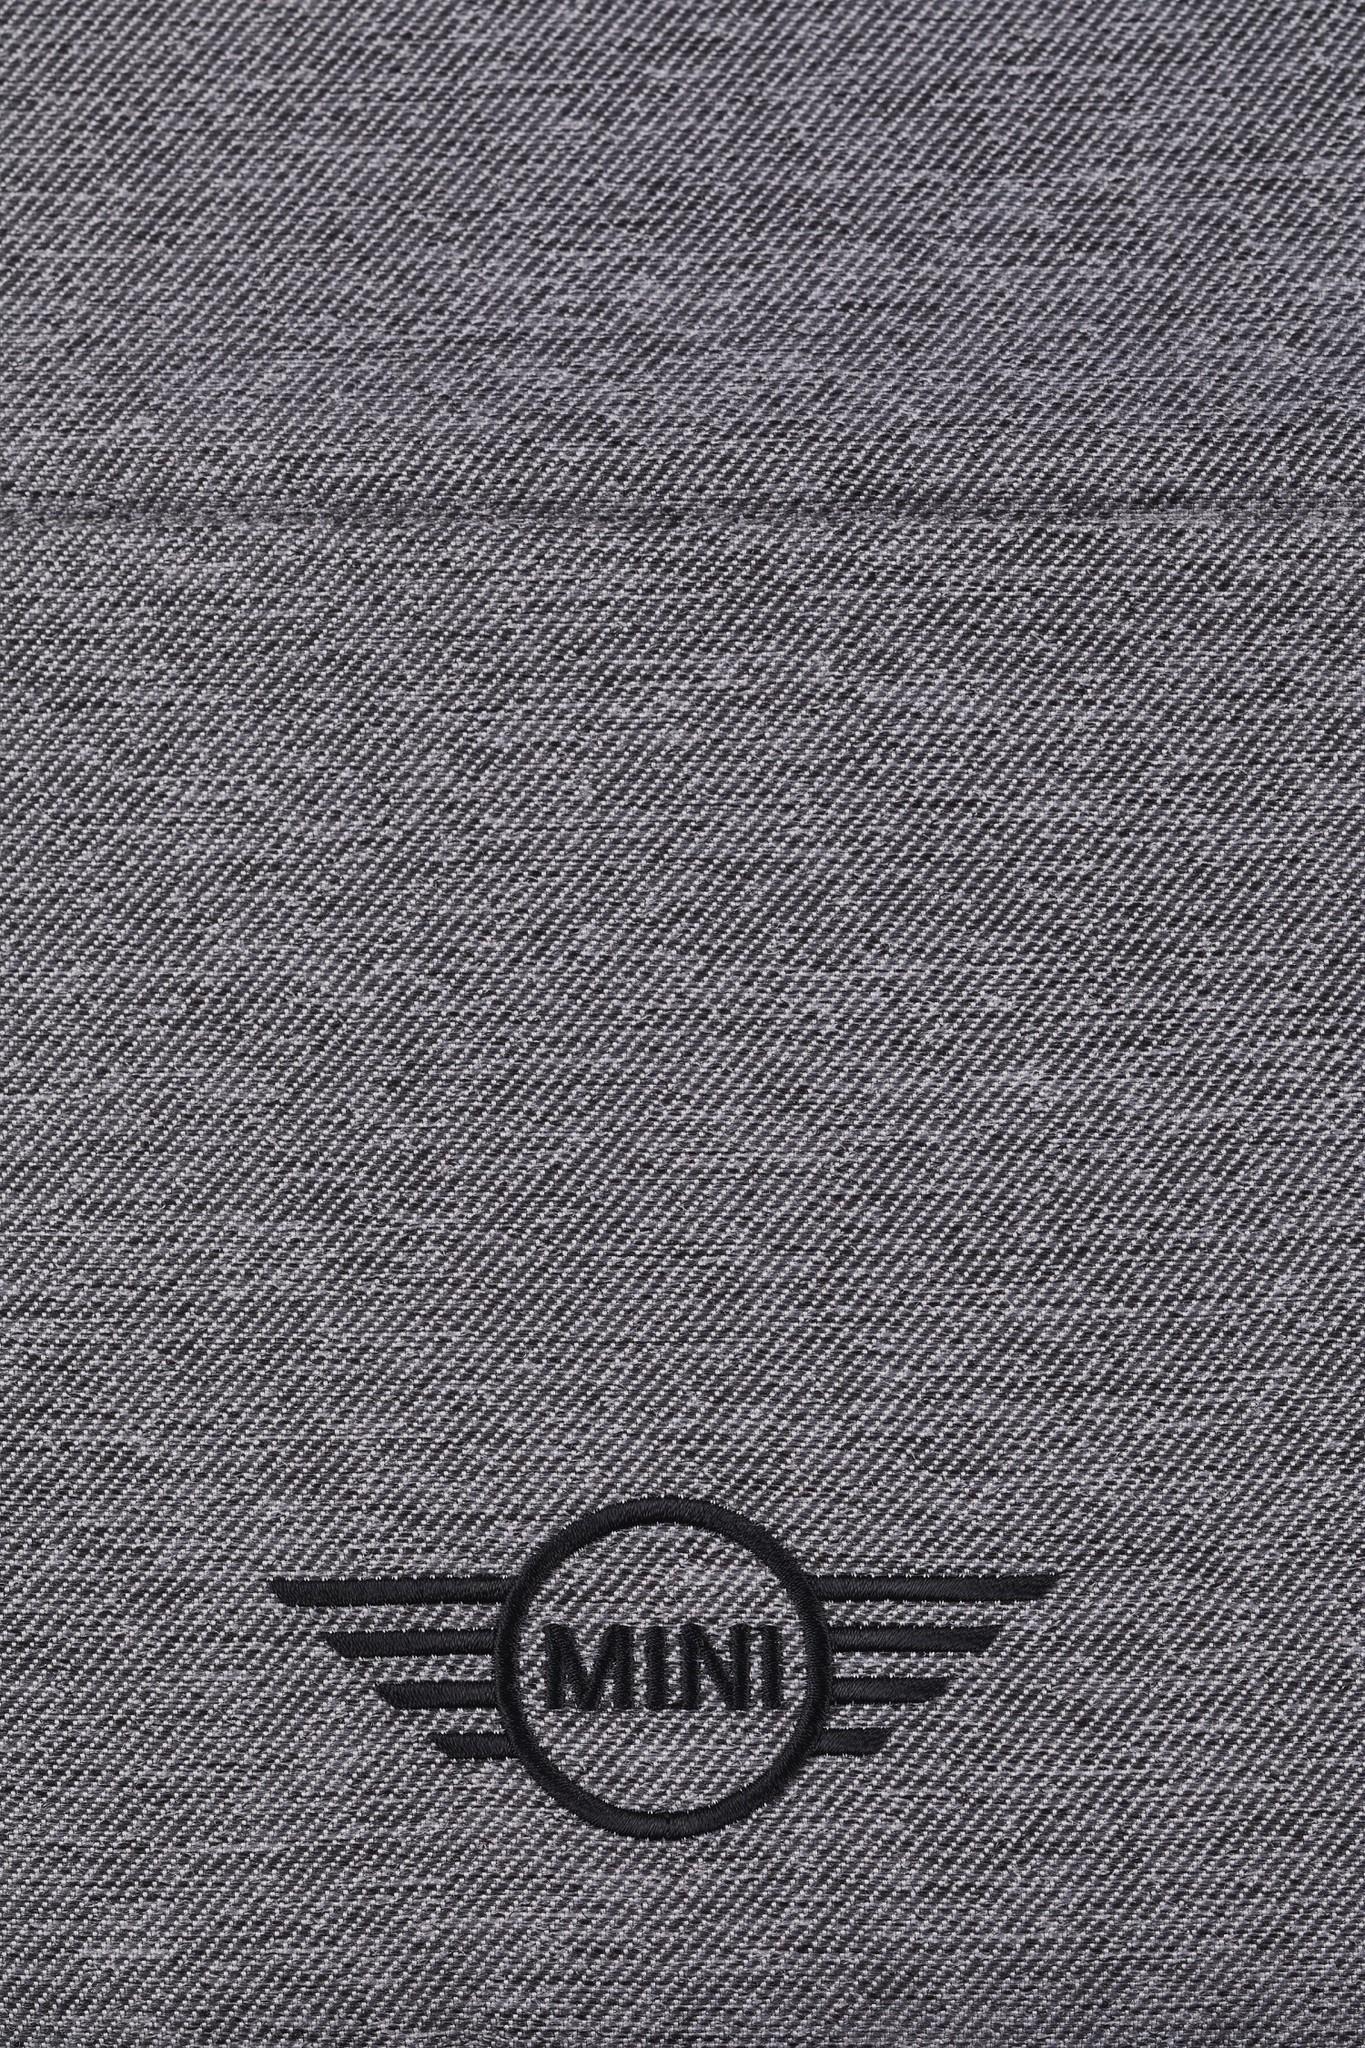 Easywalker MINI by Easywalker Buggy GO Soho Grey